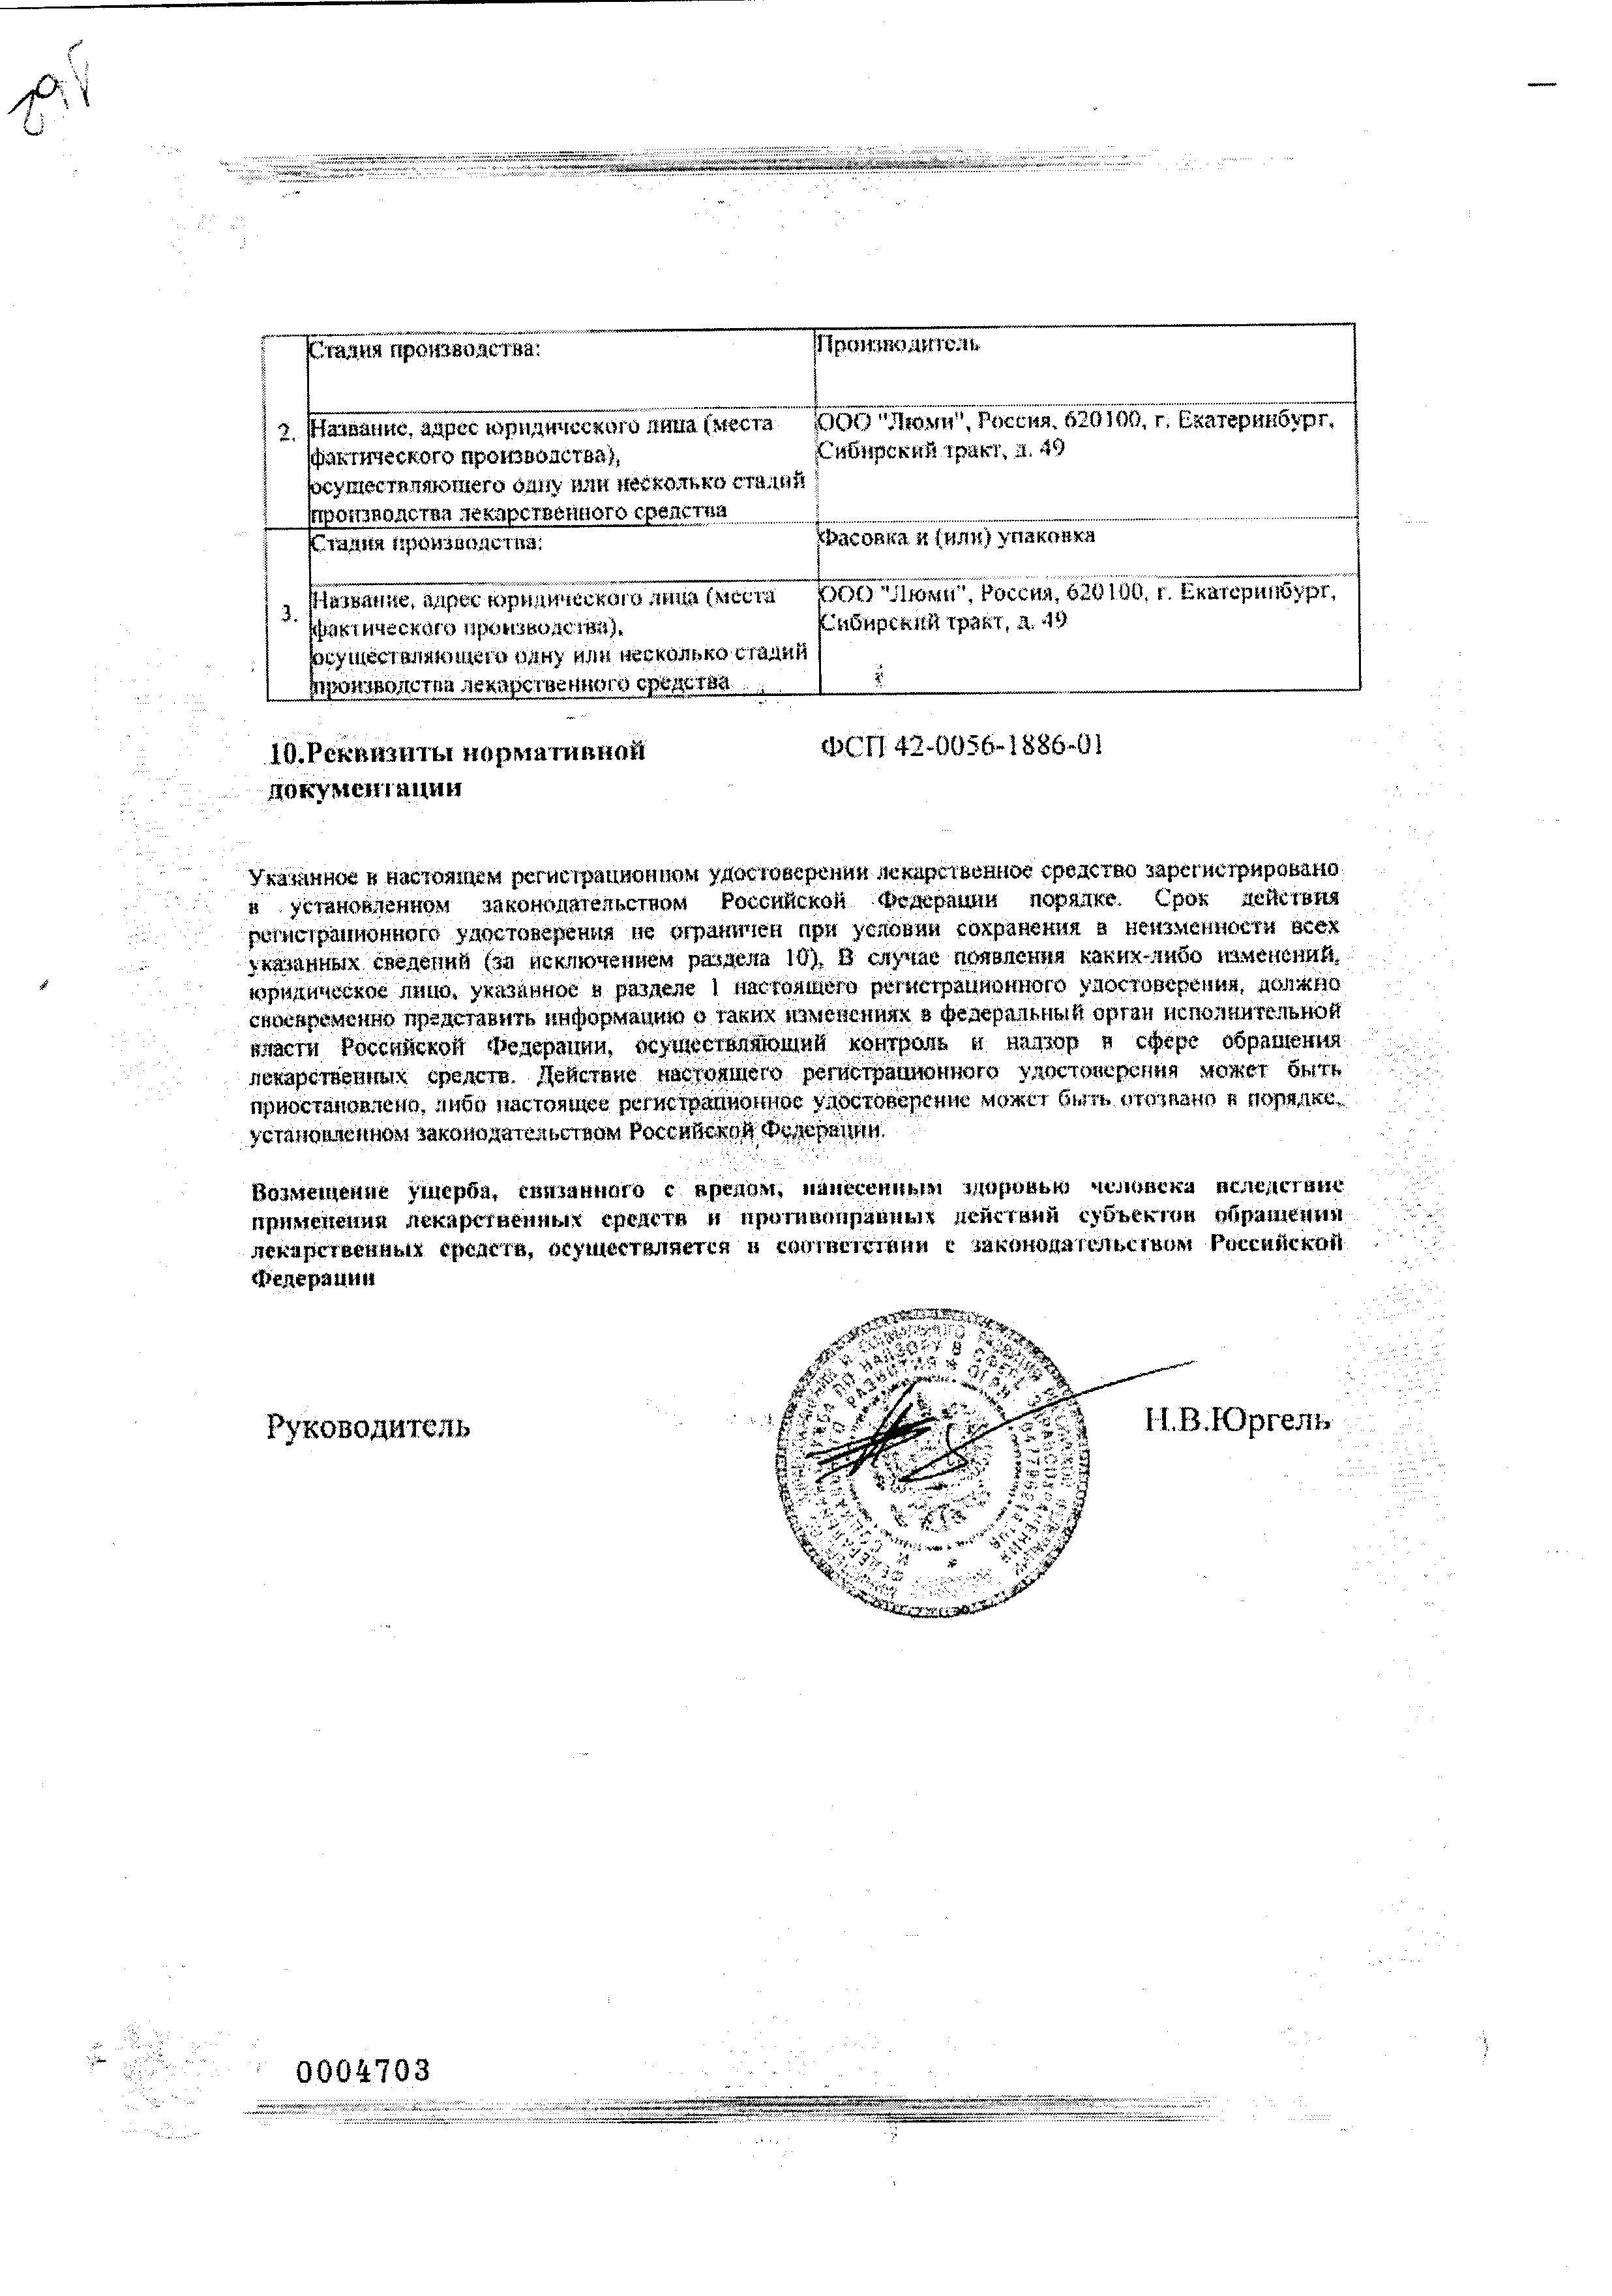 Ретинола ацетат (Витамин А) сертификат